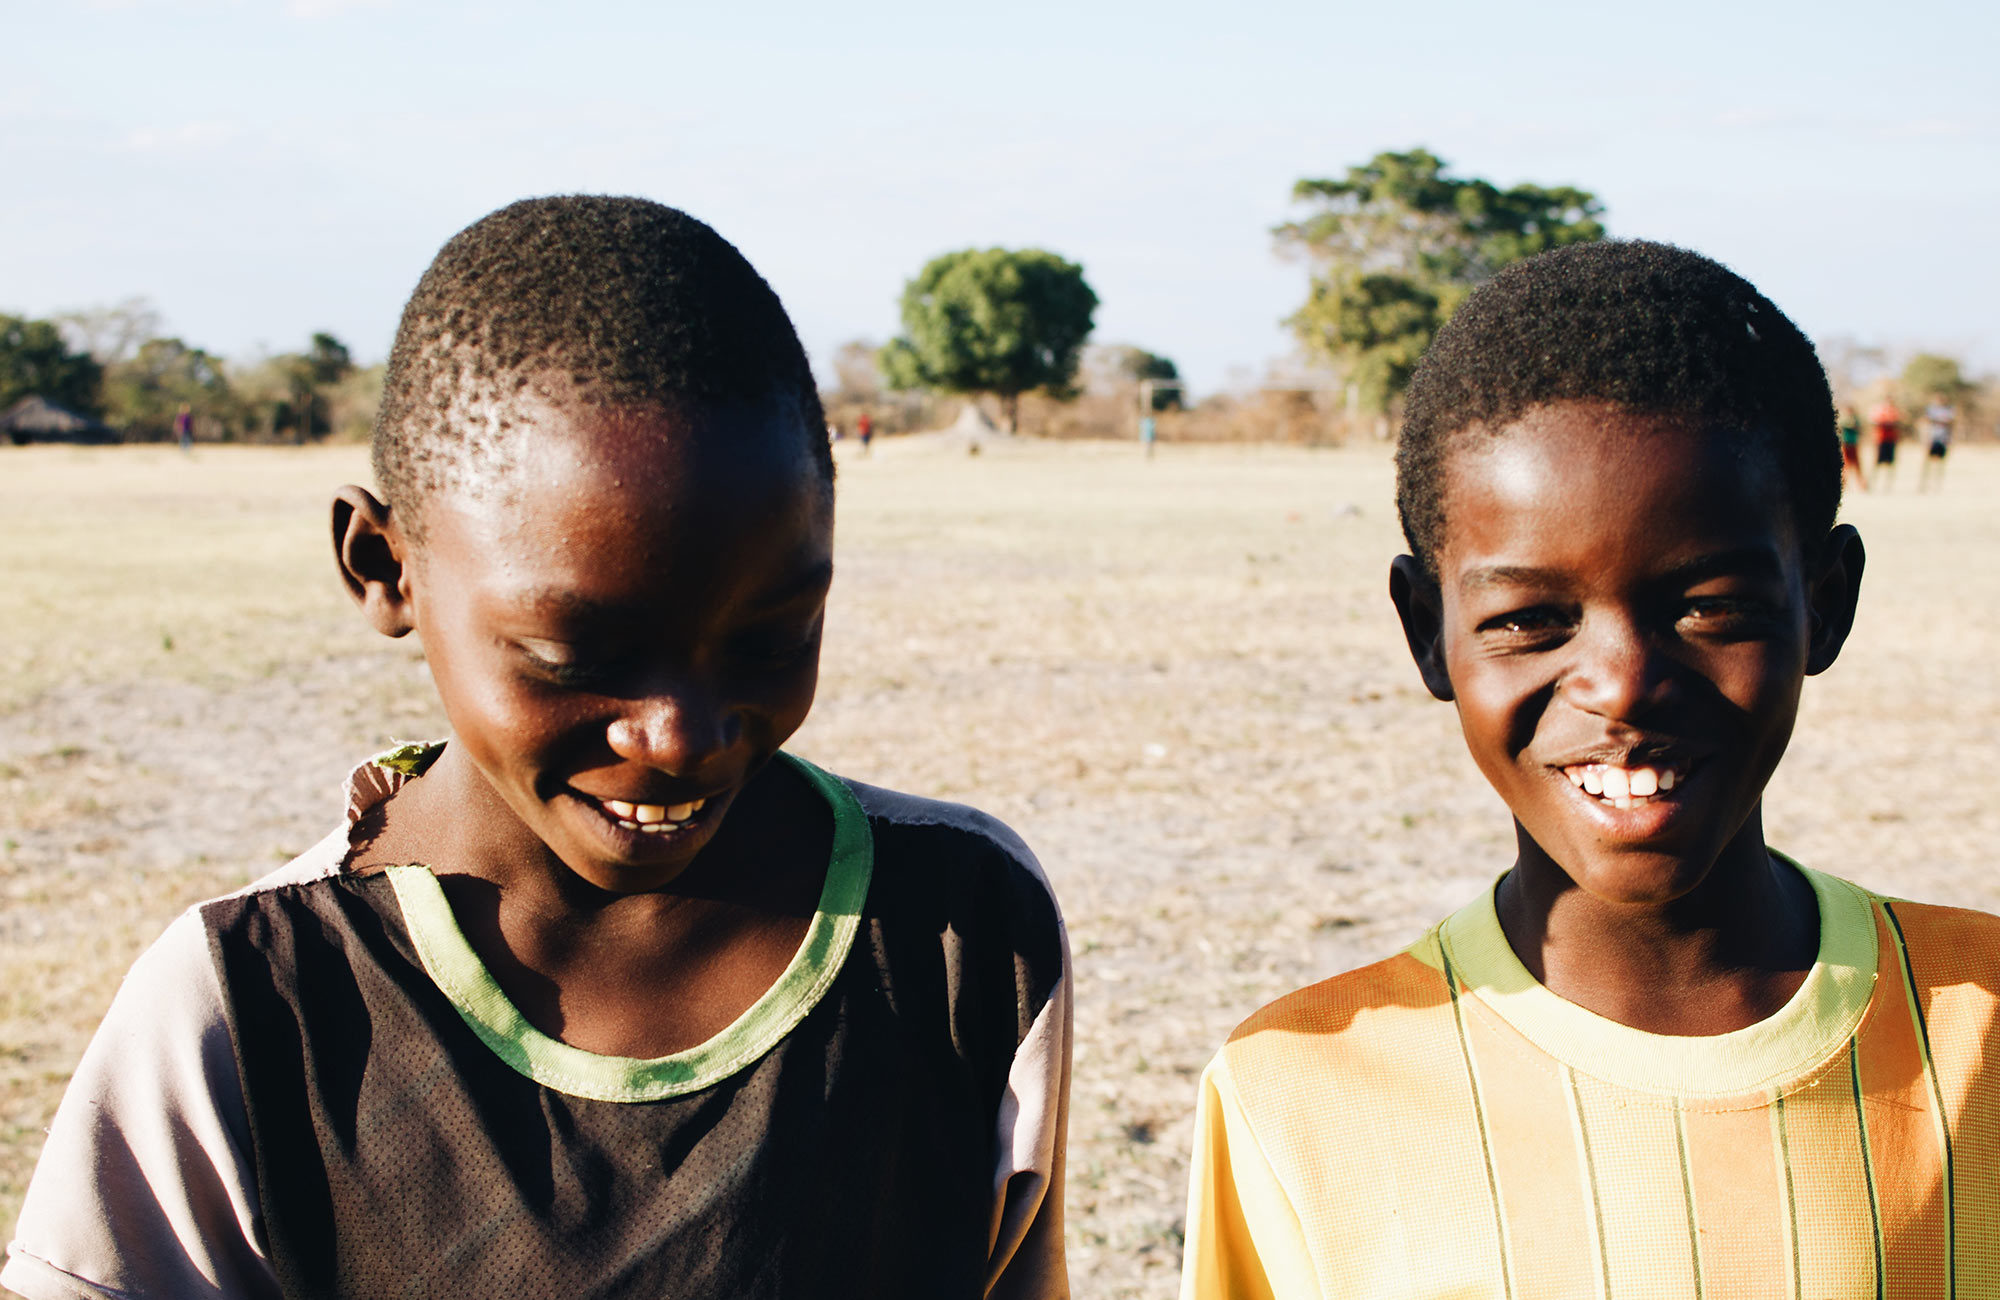 Frivillig arbeid i Afrika   KILROY